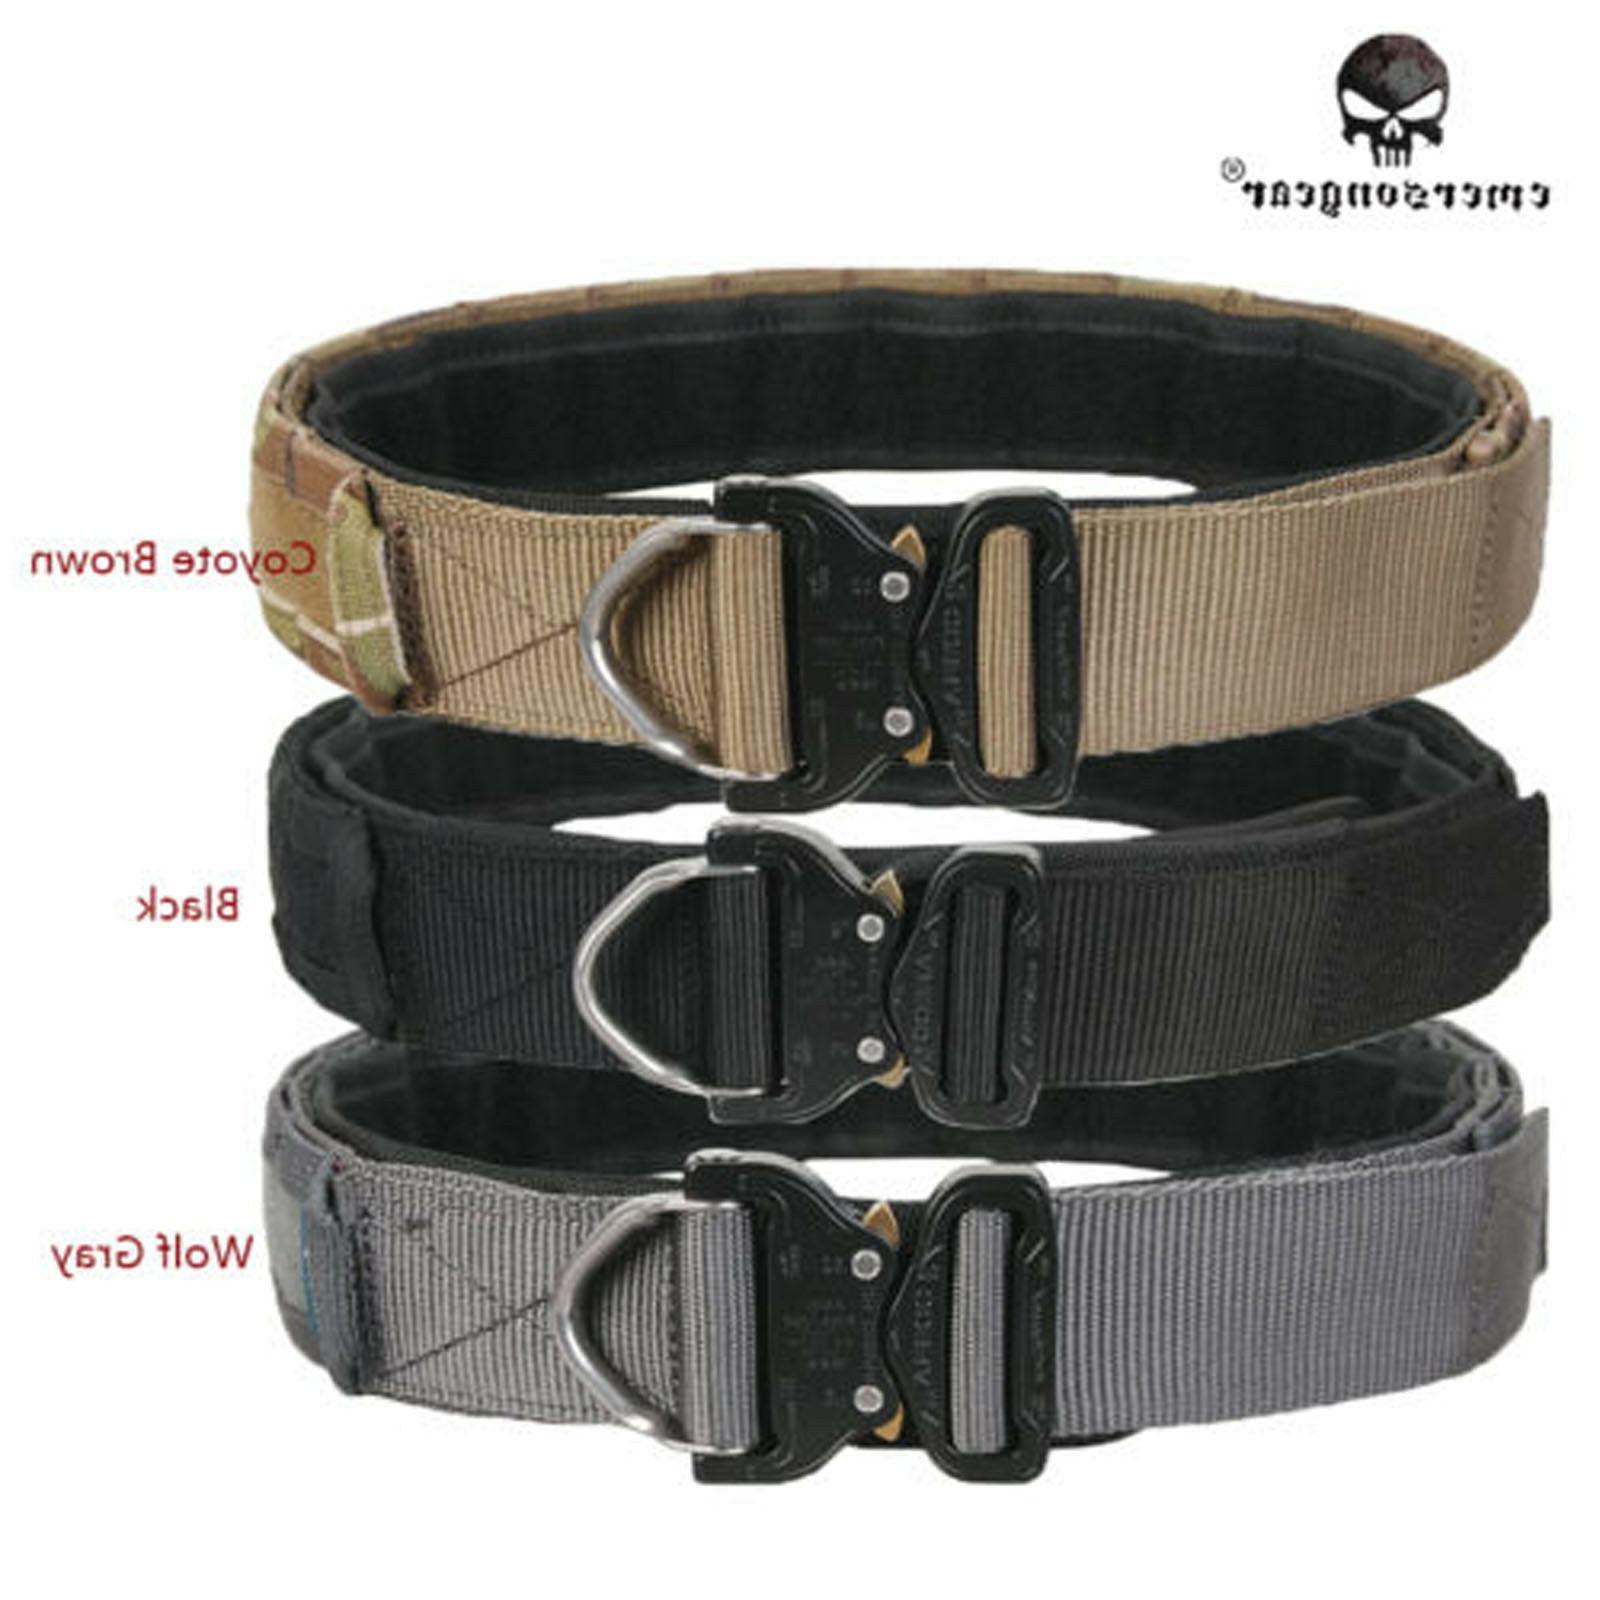 cobra riggers belt d ring molle 1